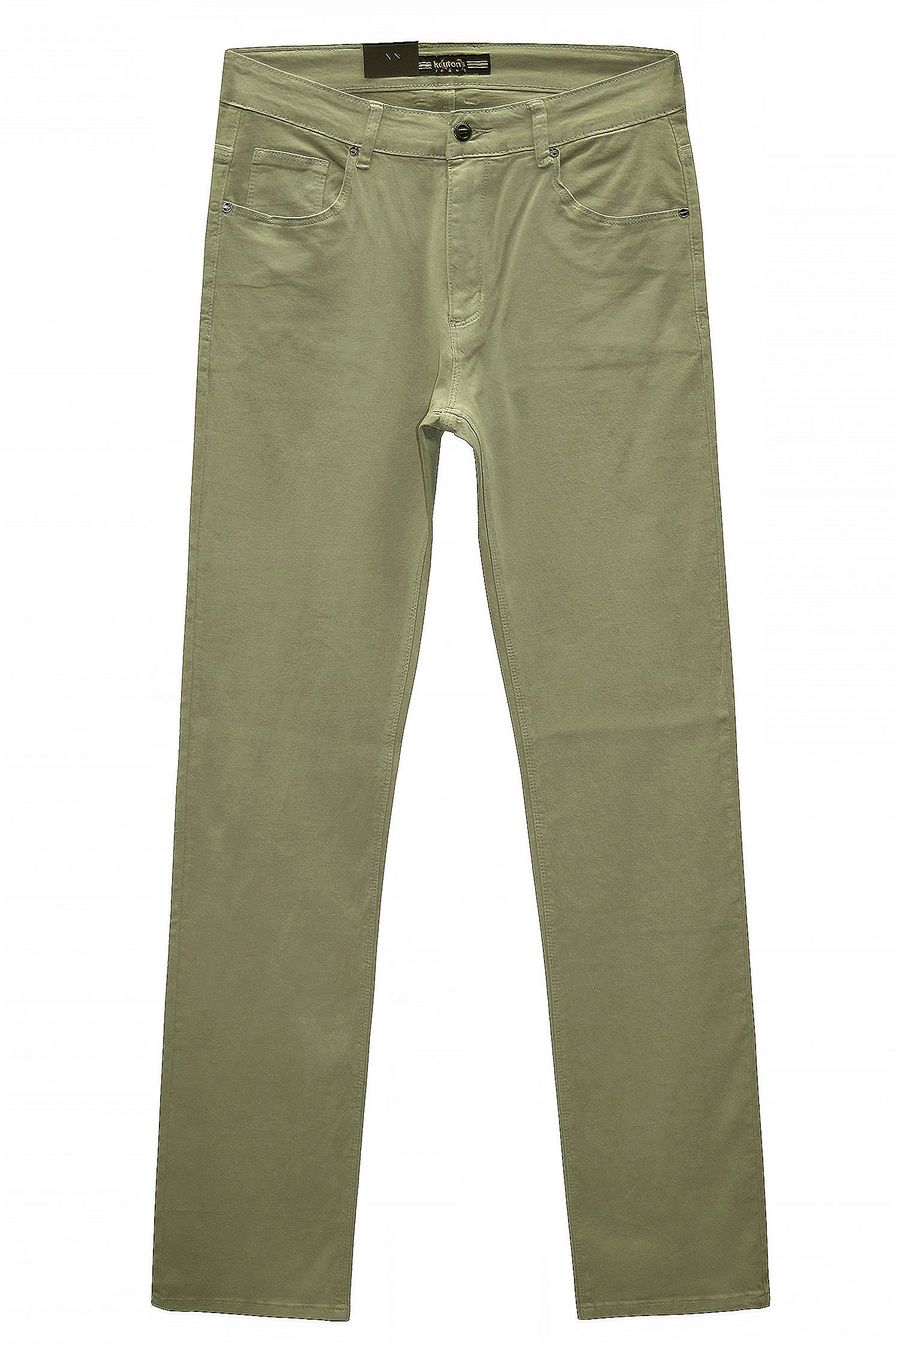 Джинсы мужские Koutons KL-1674 Stretch L.Olive - фото 2